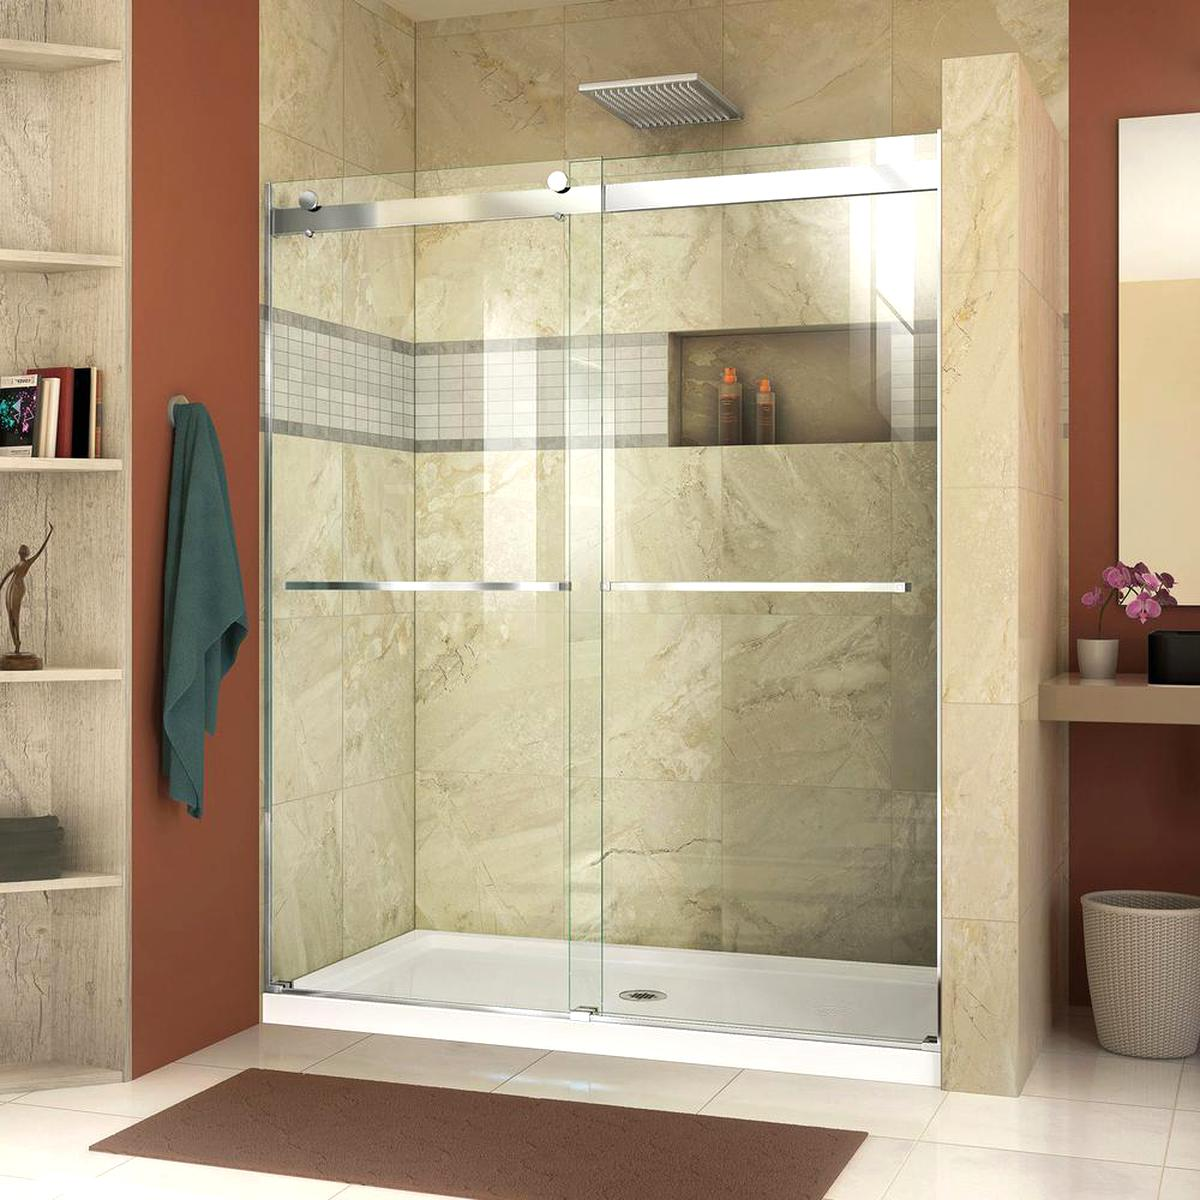 Shower Door For Sale Only 3 Left At 65